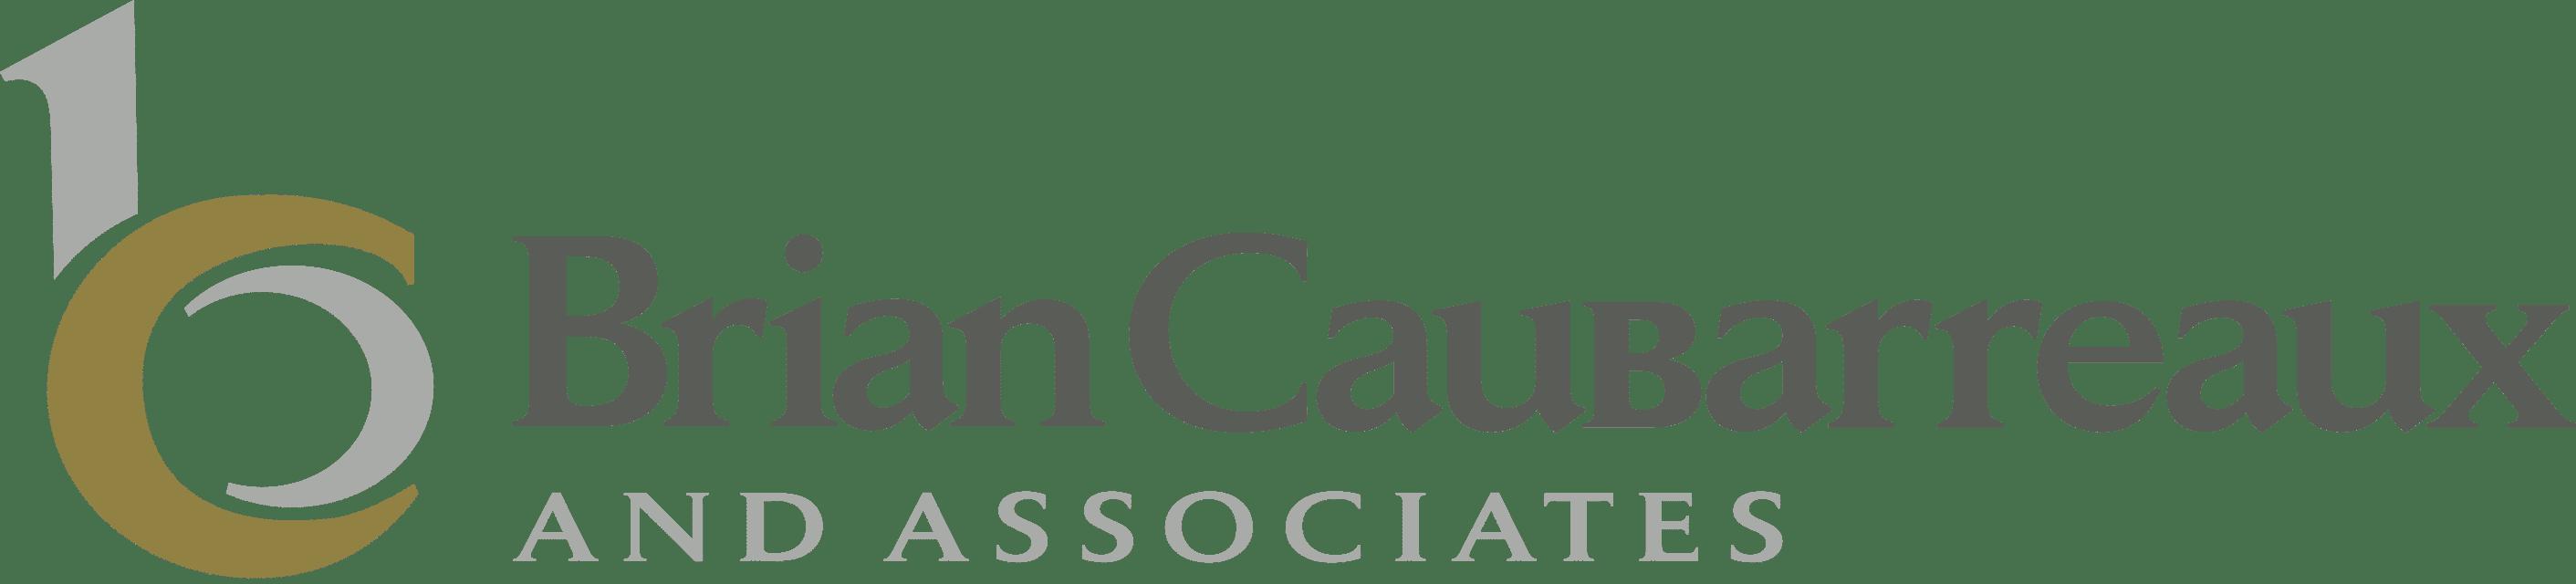 Brian Caubarreaux and Associates